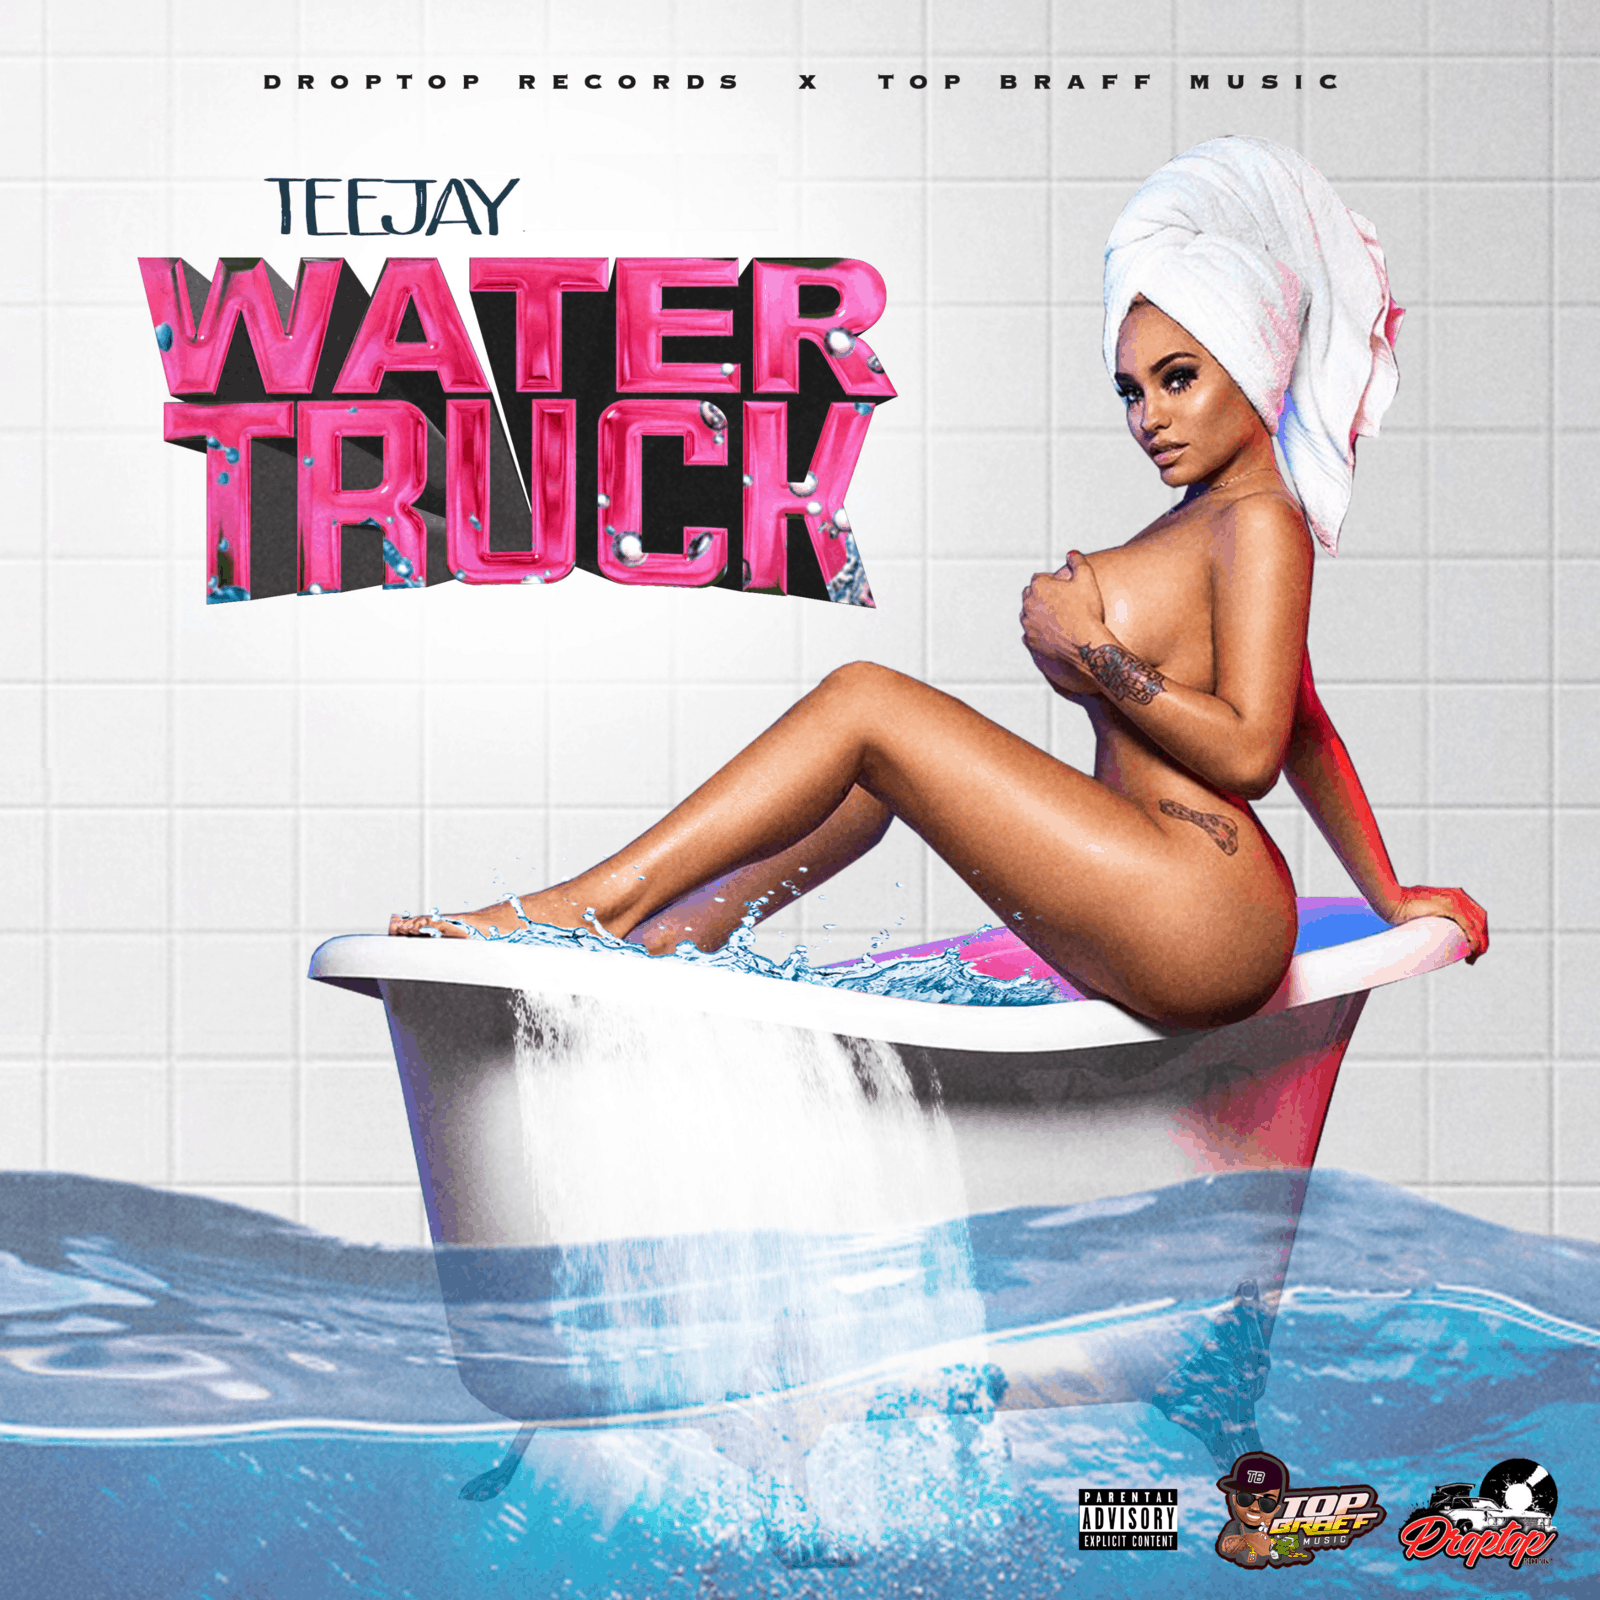 Teejay - Water Truck - DropTop Records